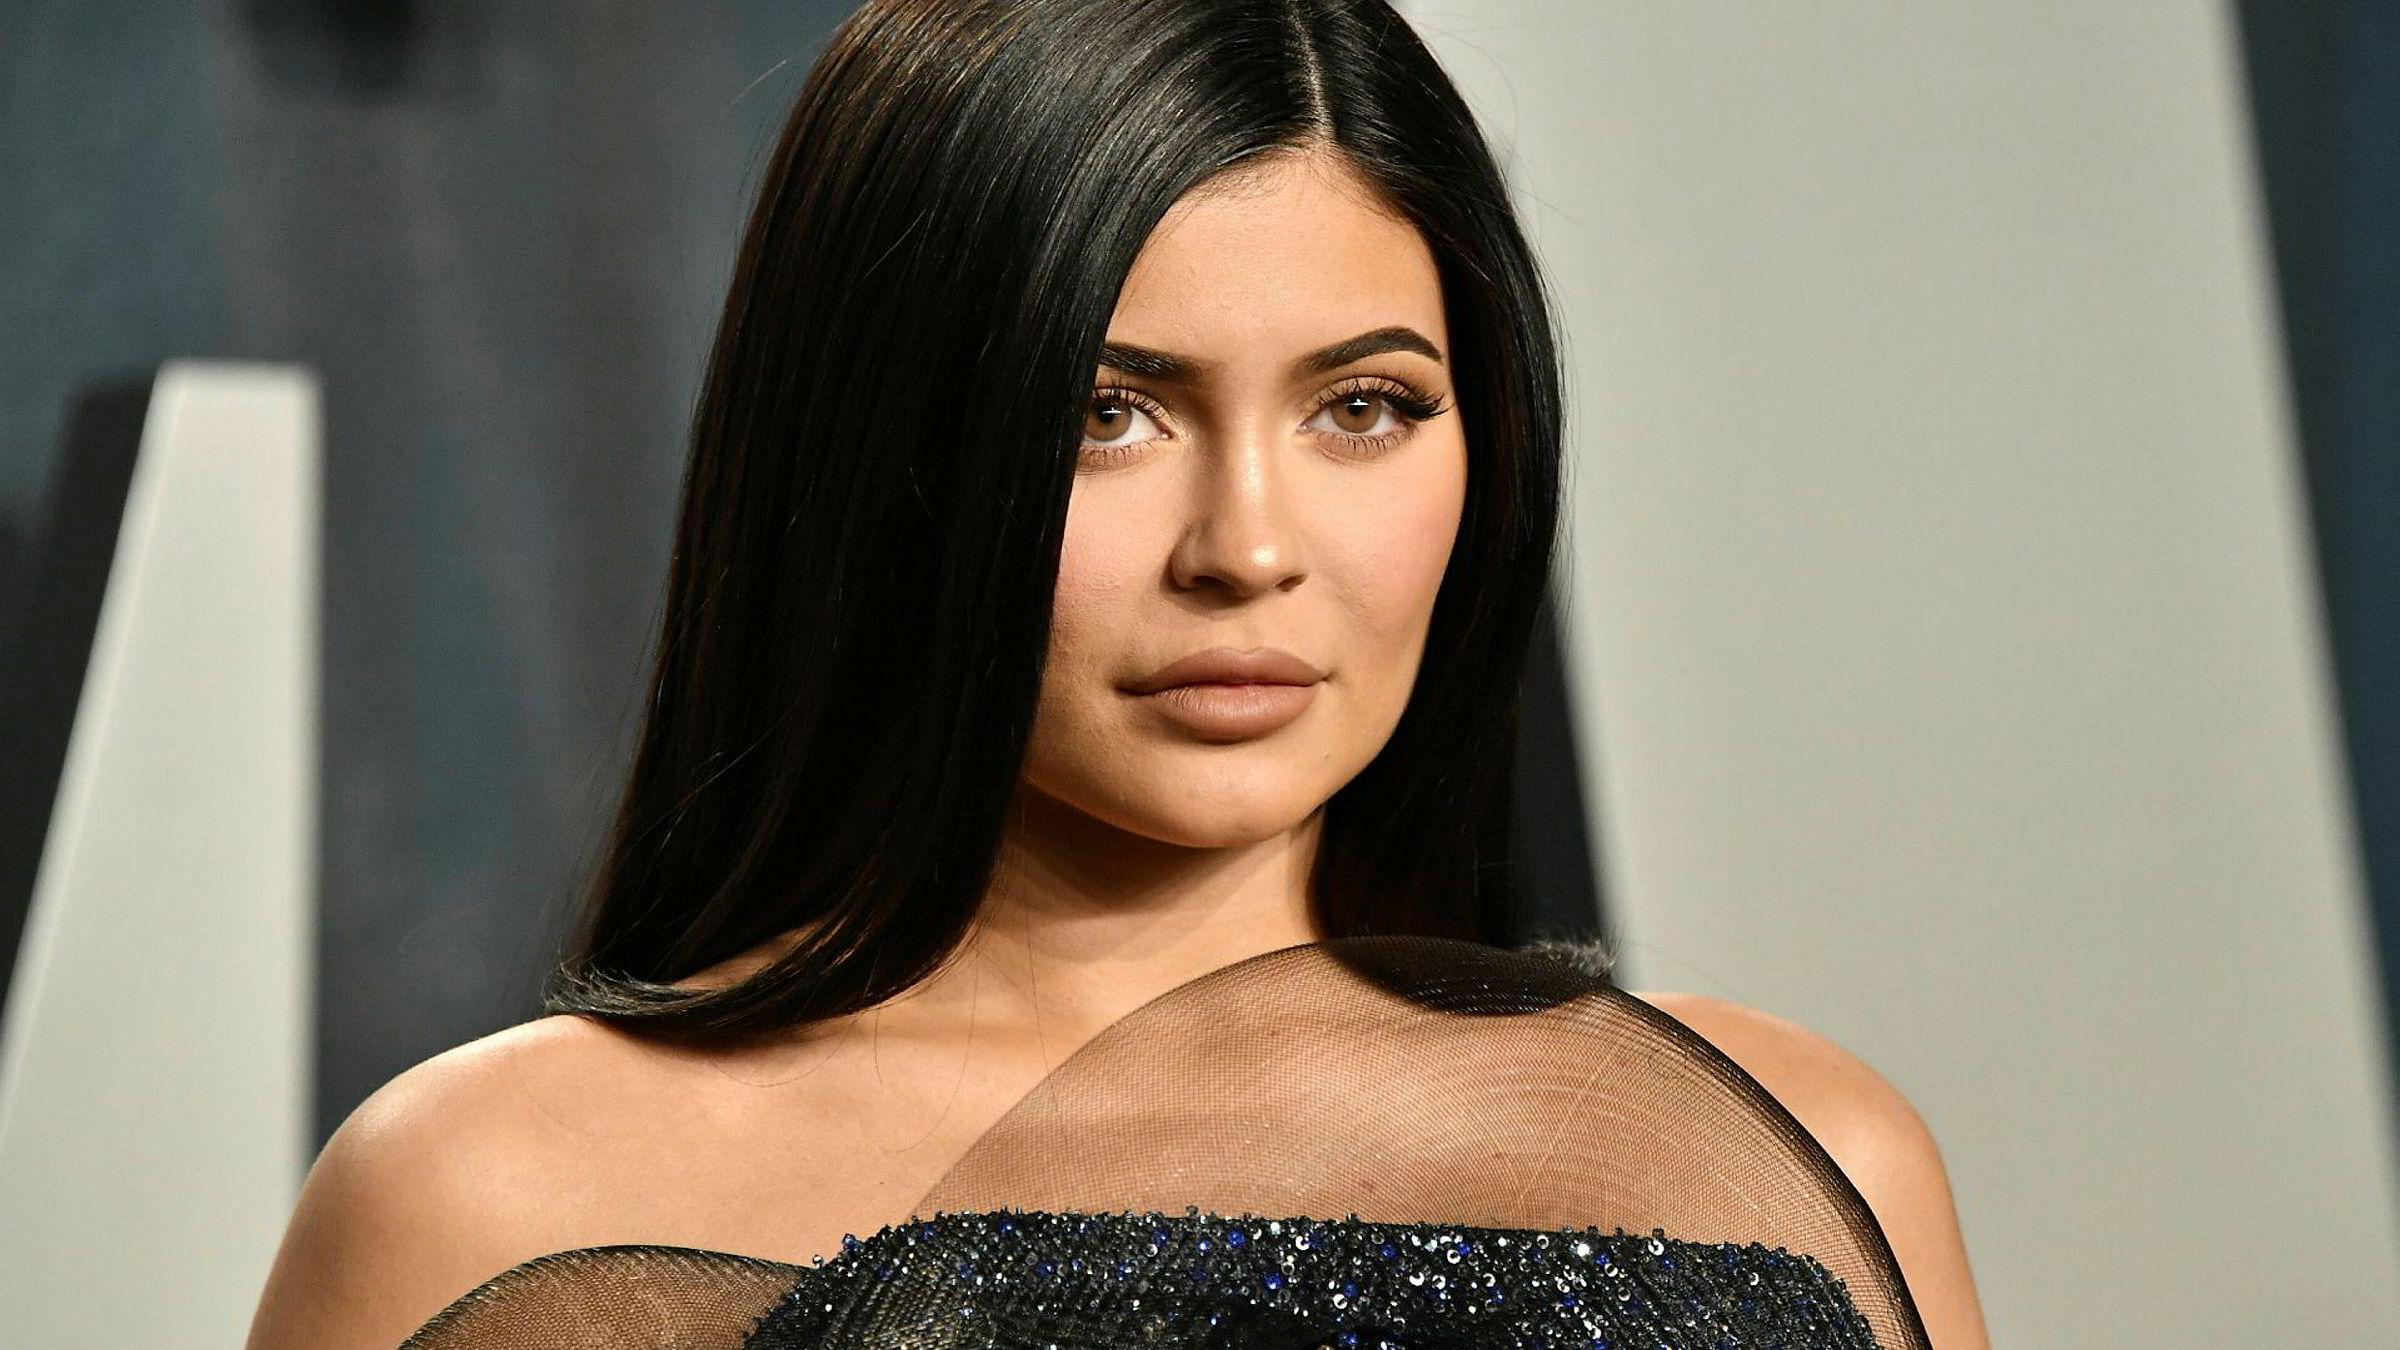 Kylie Jenner ble kåret til verdens yngste dollarmilliardær for andre gang tidligere i år.